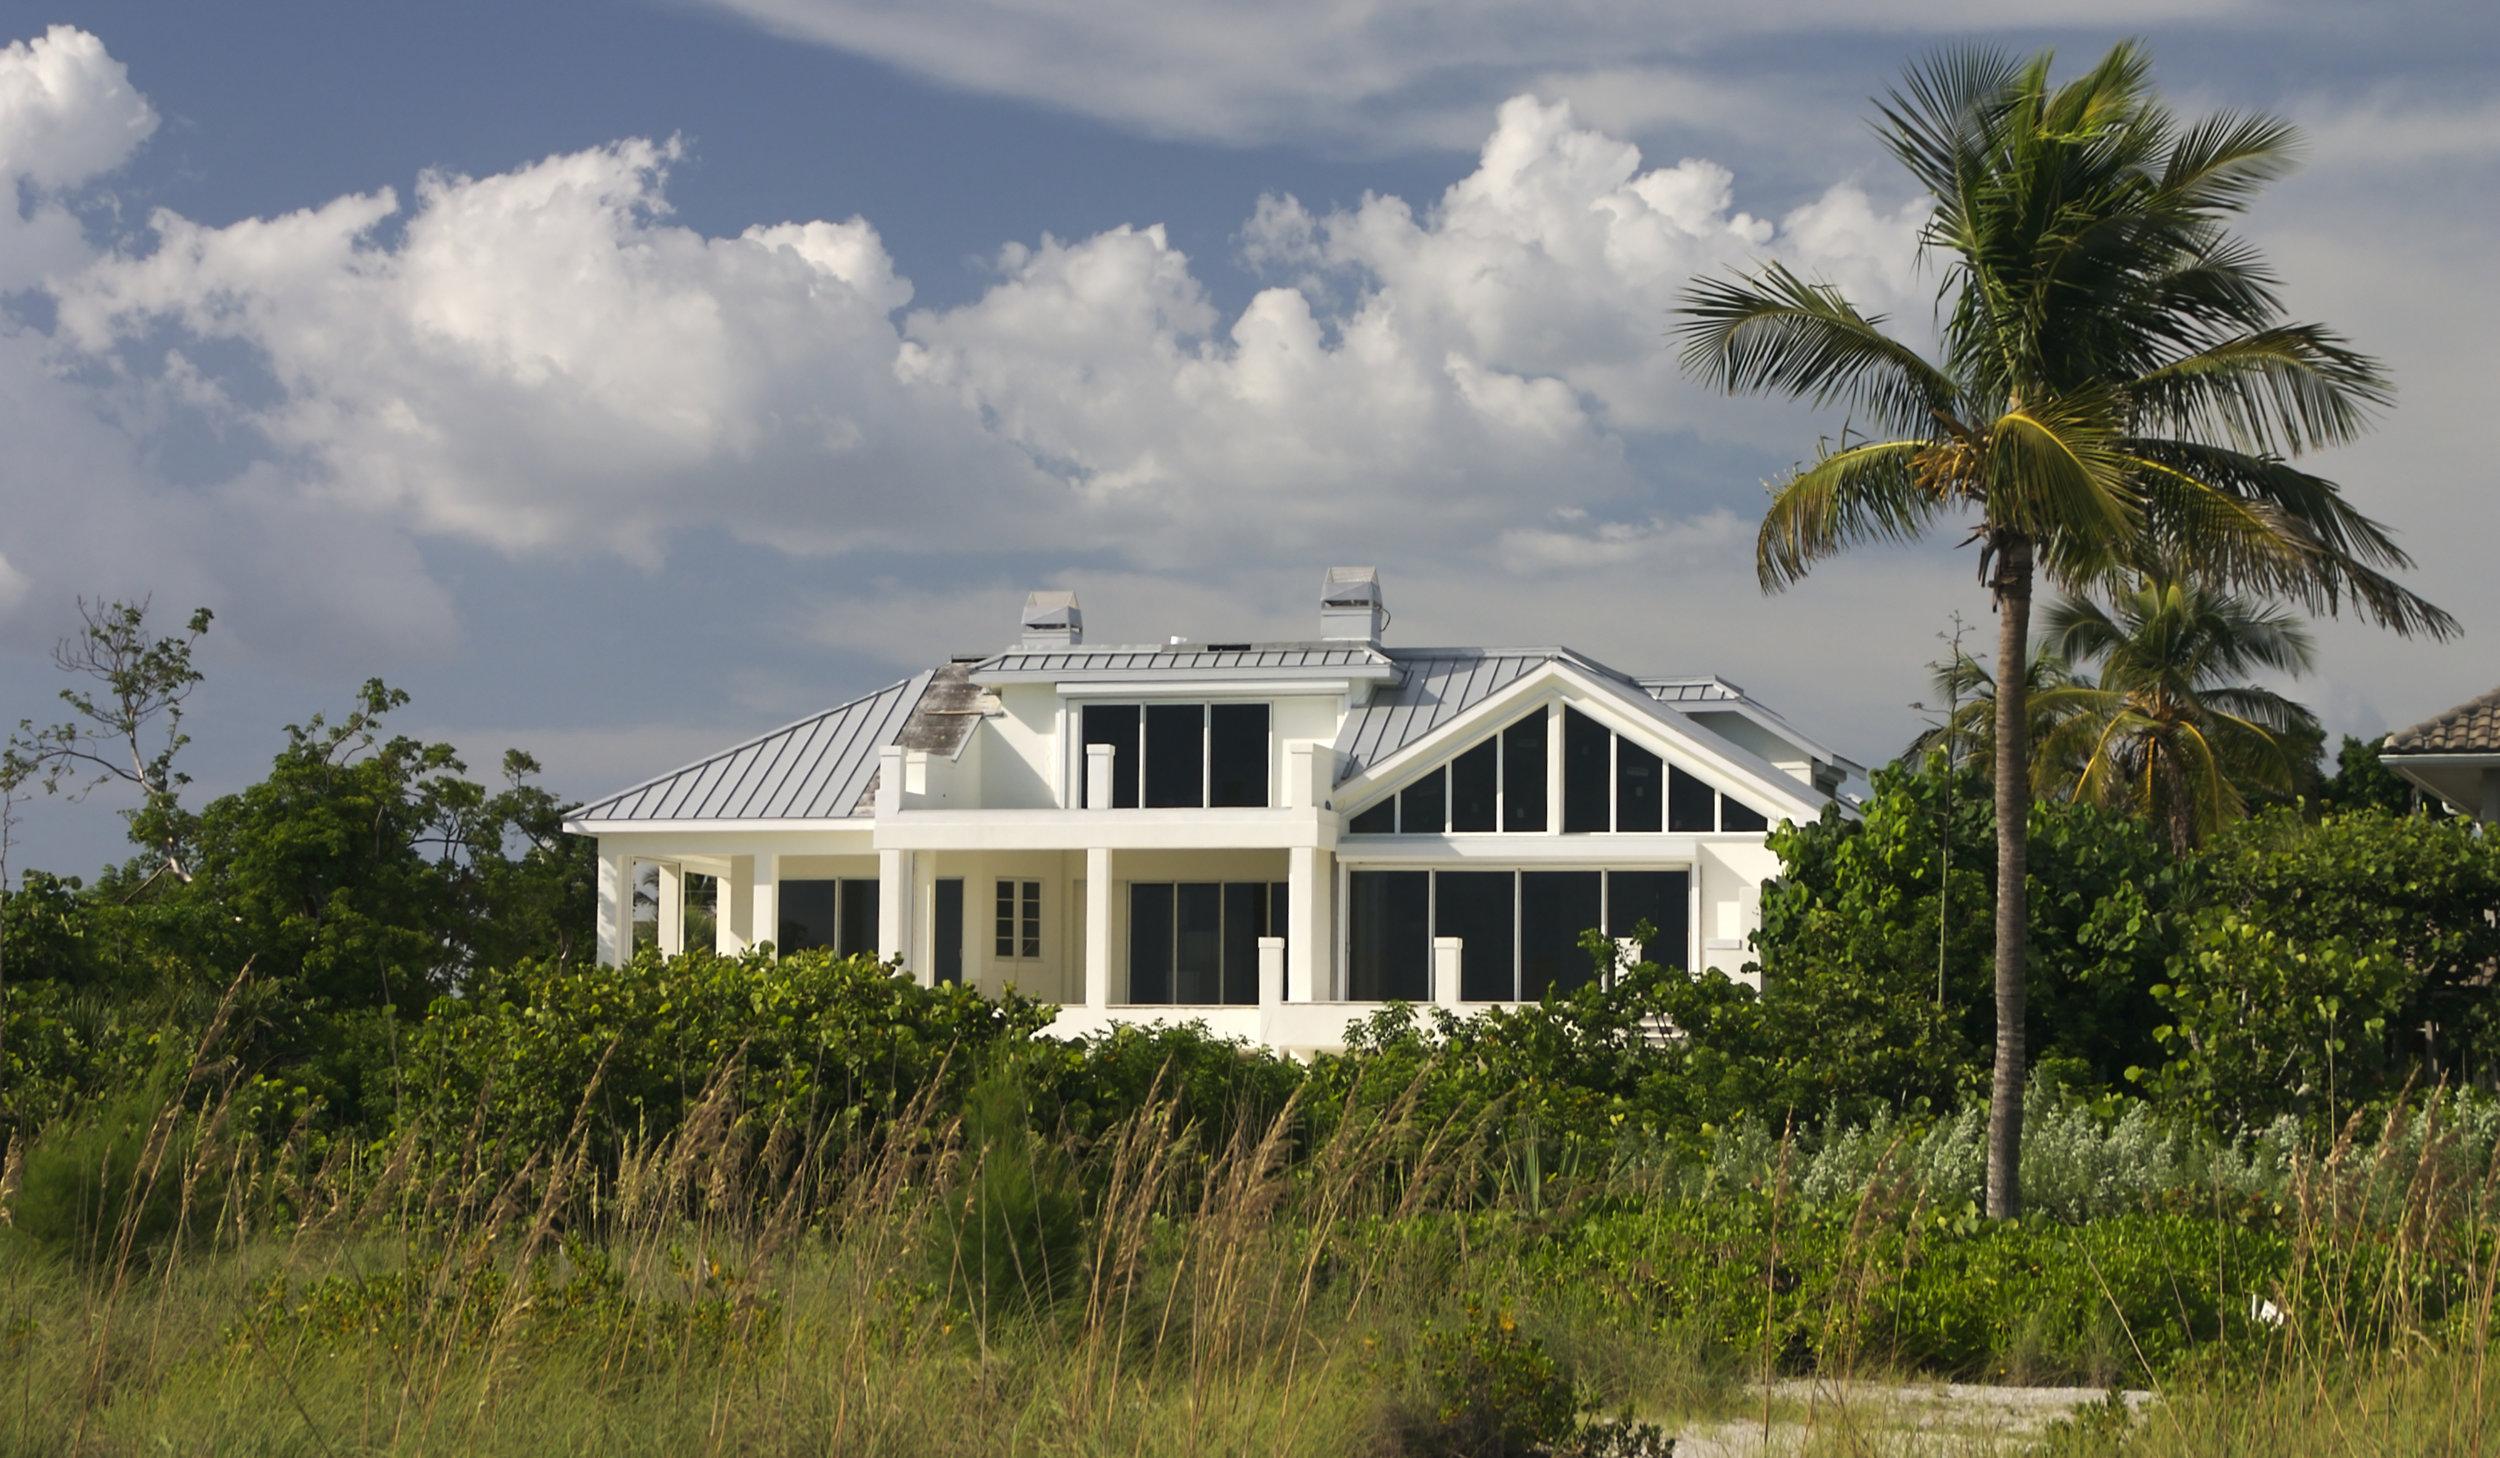 shutterstock_florida_style_home.jpg